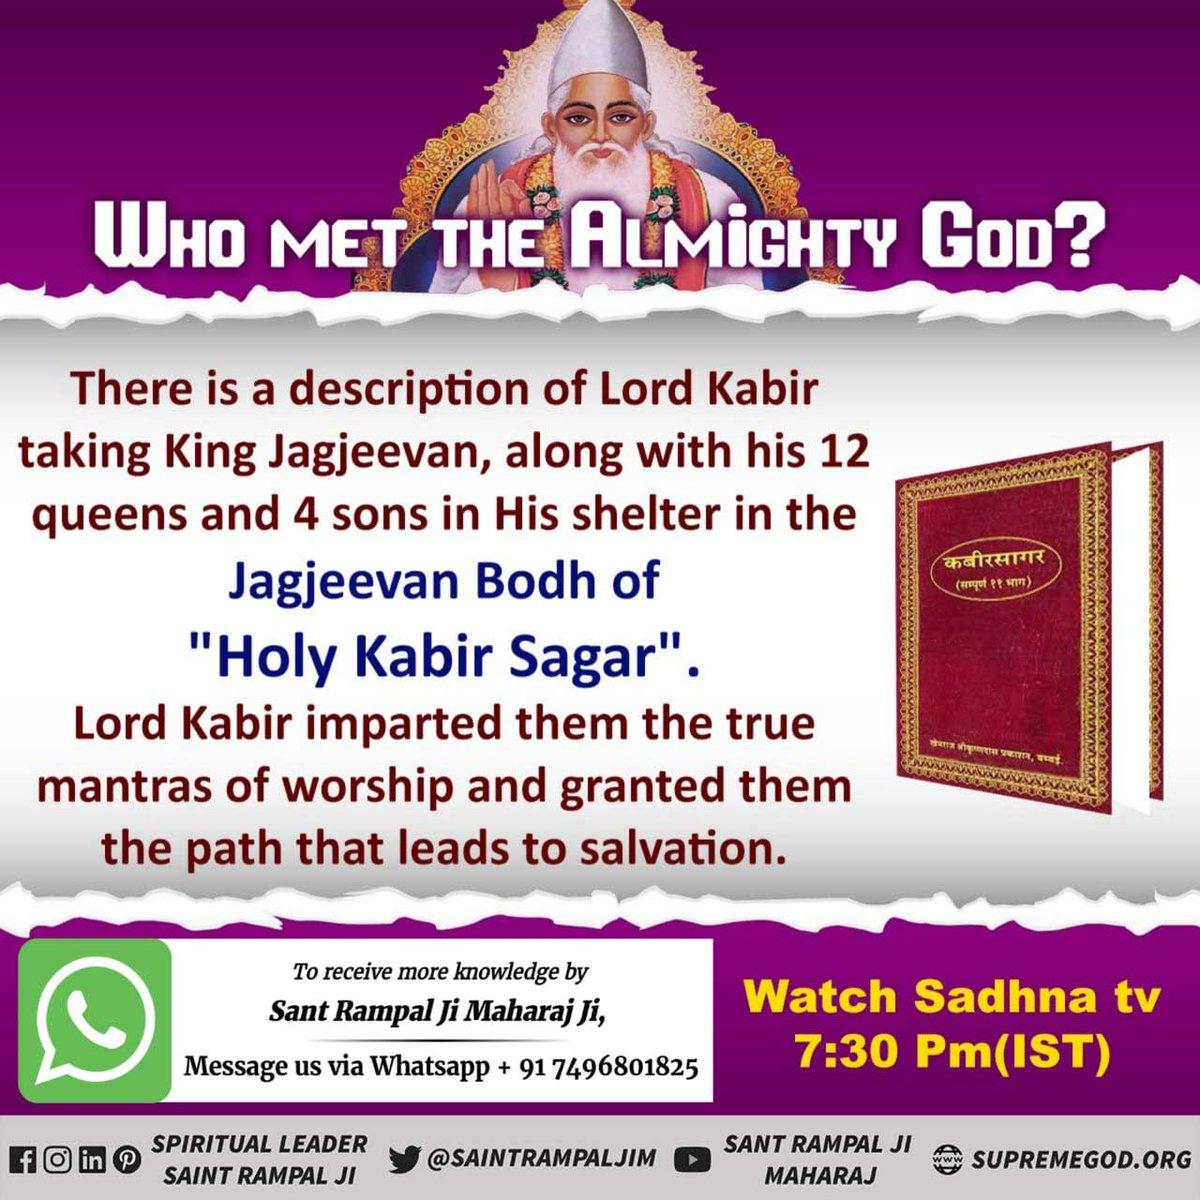 #fridaymorning God kabir imparted them  the true mantas if worship. Almighty God kabir <br>http://pic.twitter.com/d5zgOI9Uat